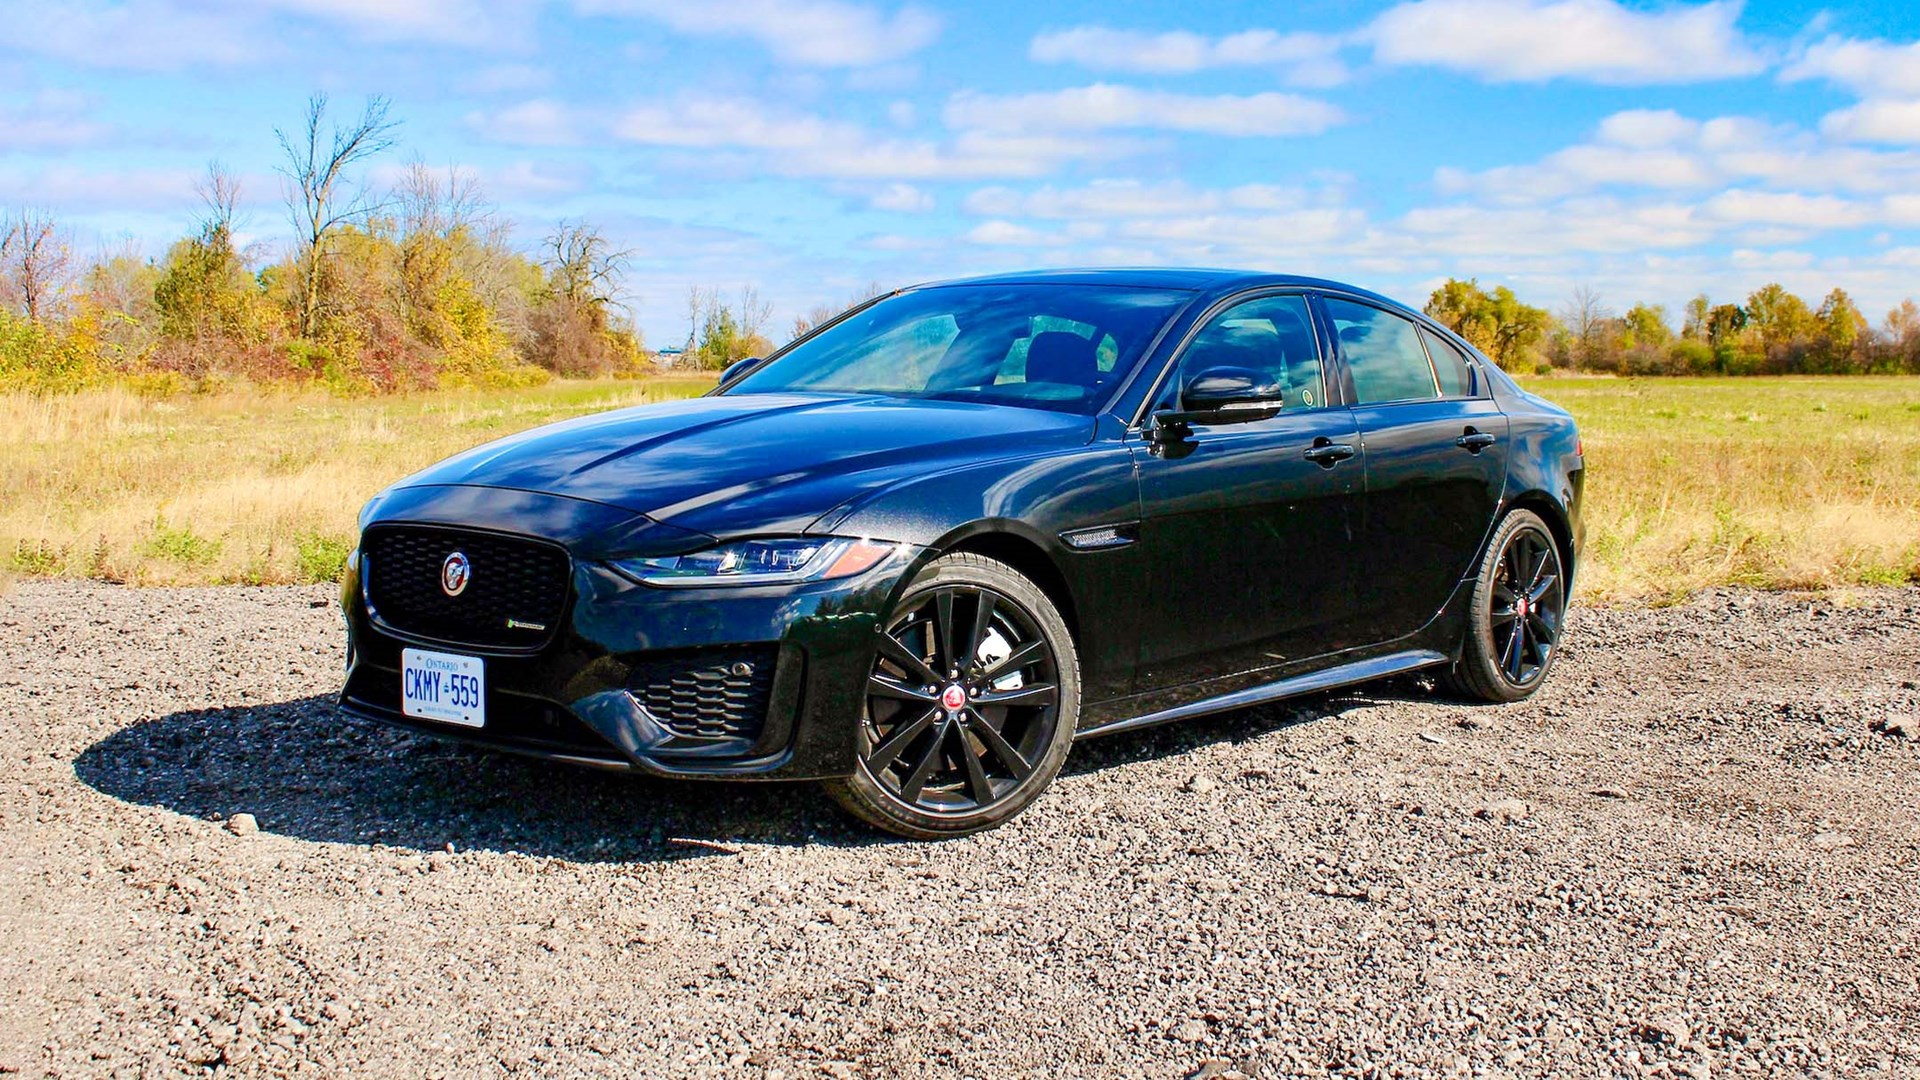 2020 Jaguar XE P300 R-Dynamic Review | Expert Reviews | autotrader.ca